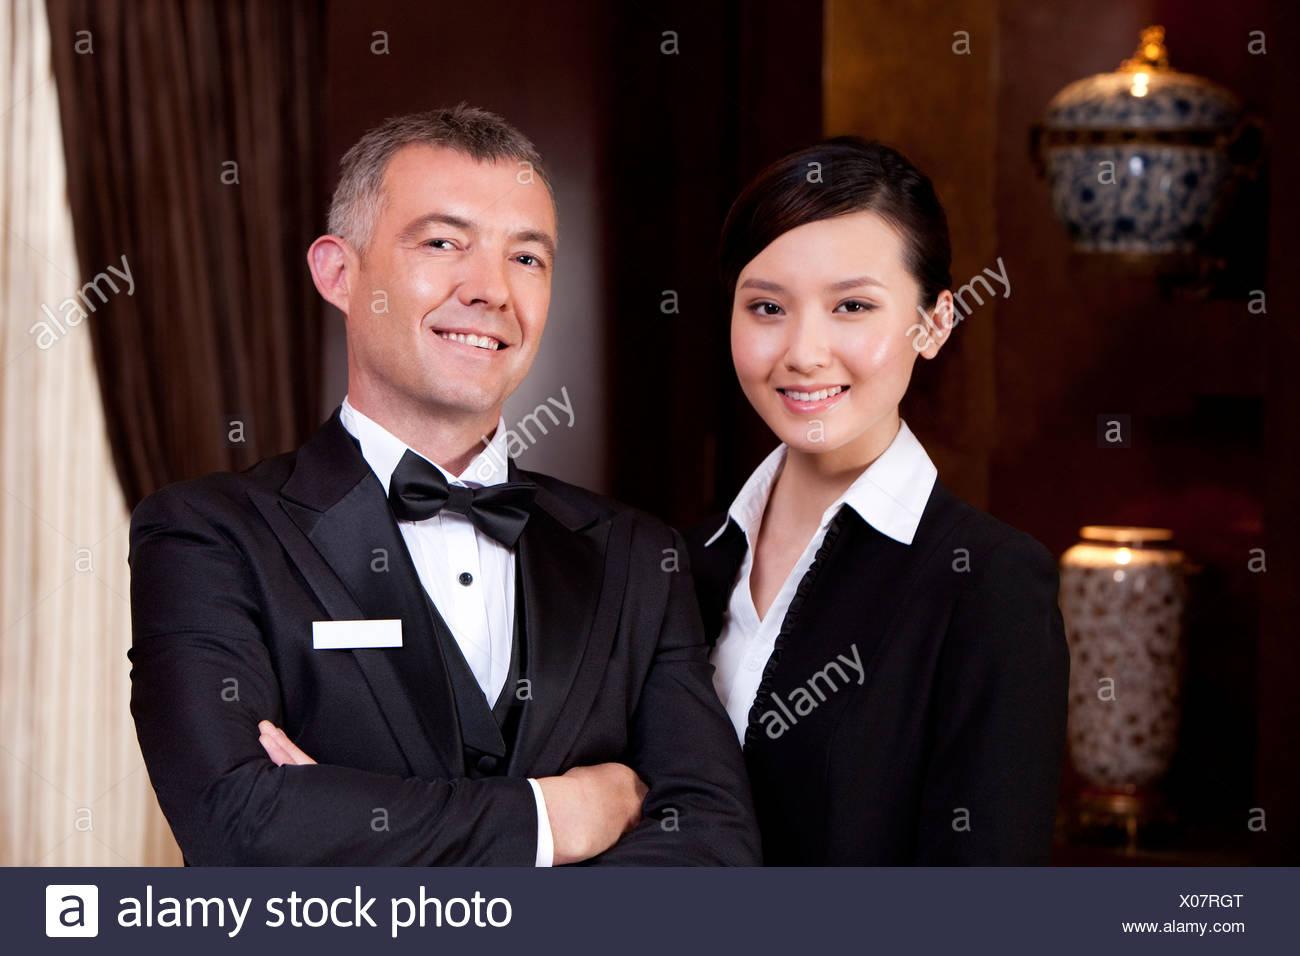 Portrait of professional service staff - Stock Image